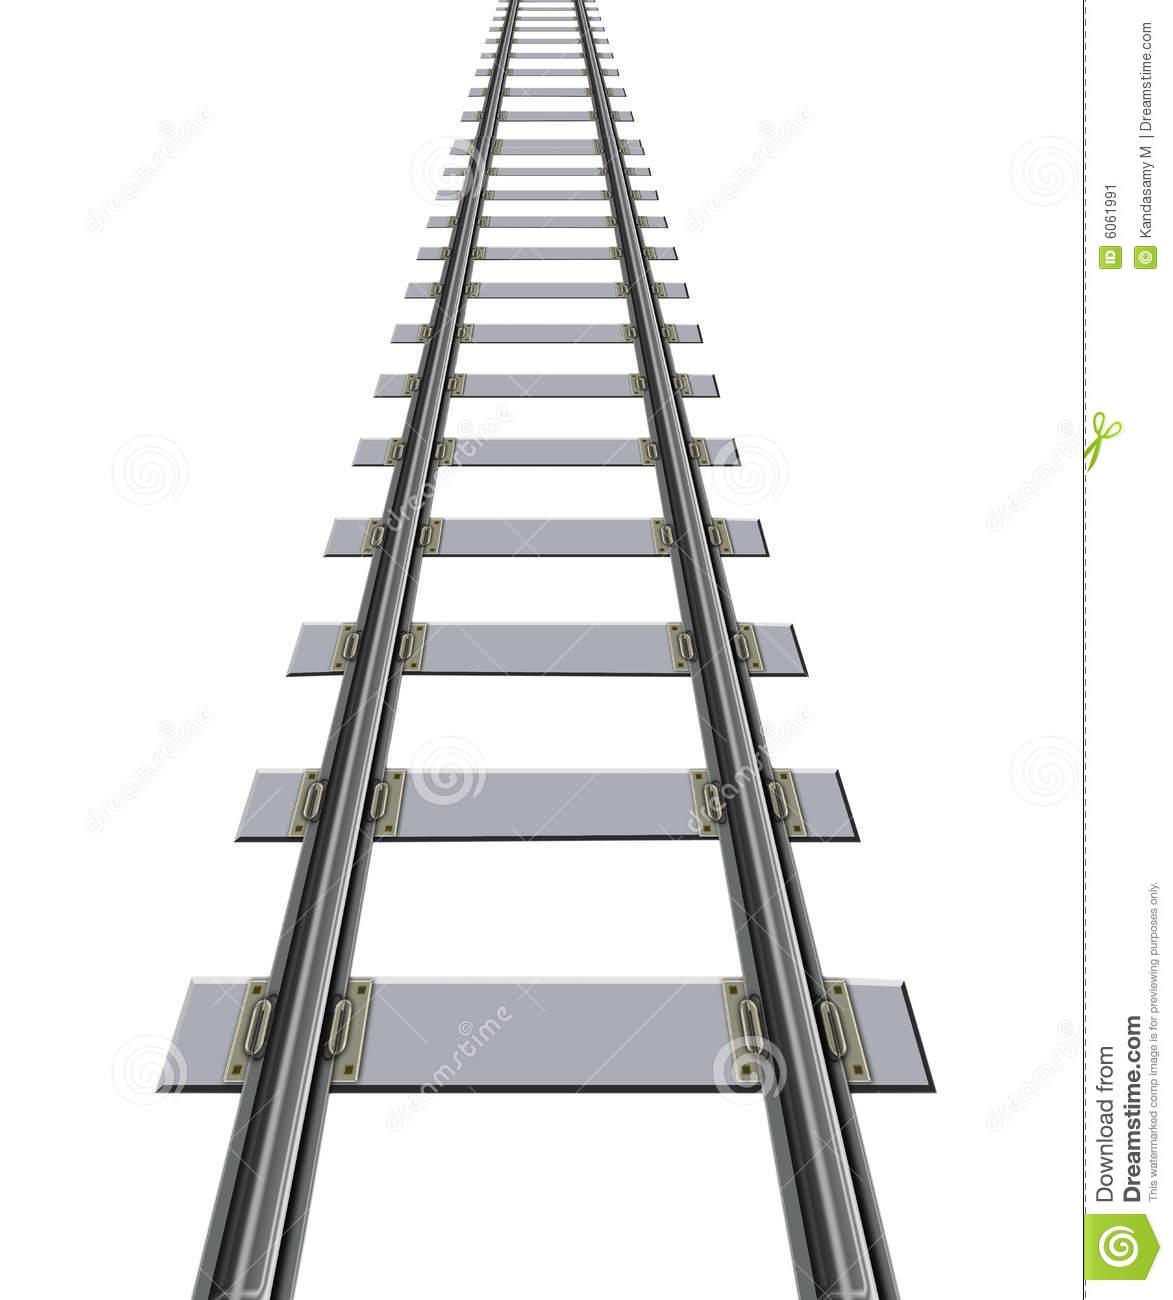 Train tracks clipart black and white.